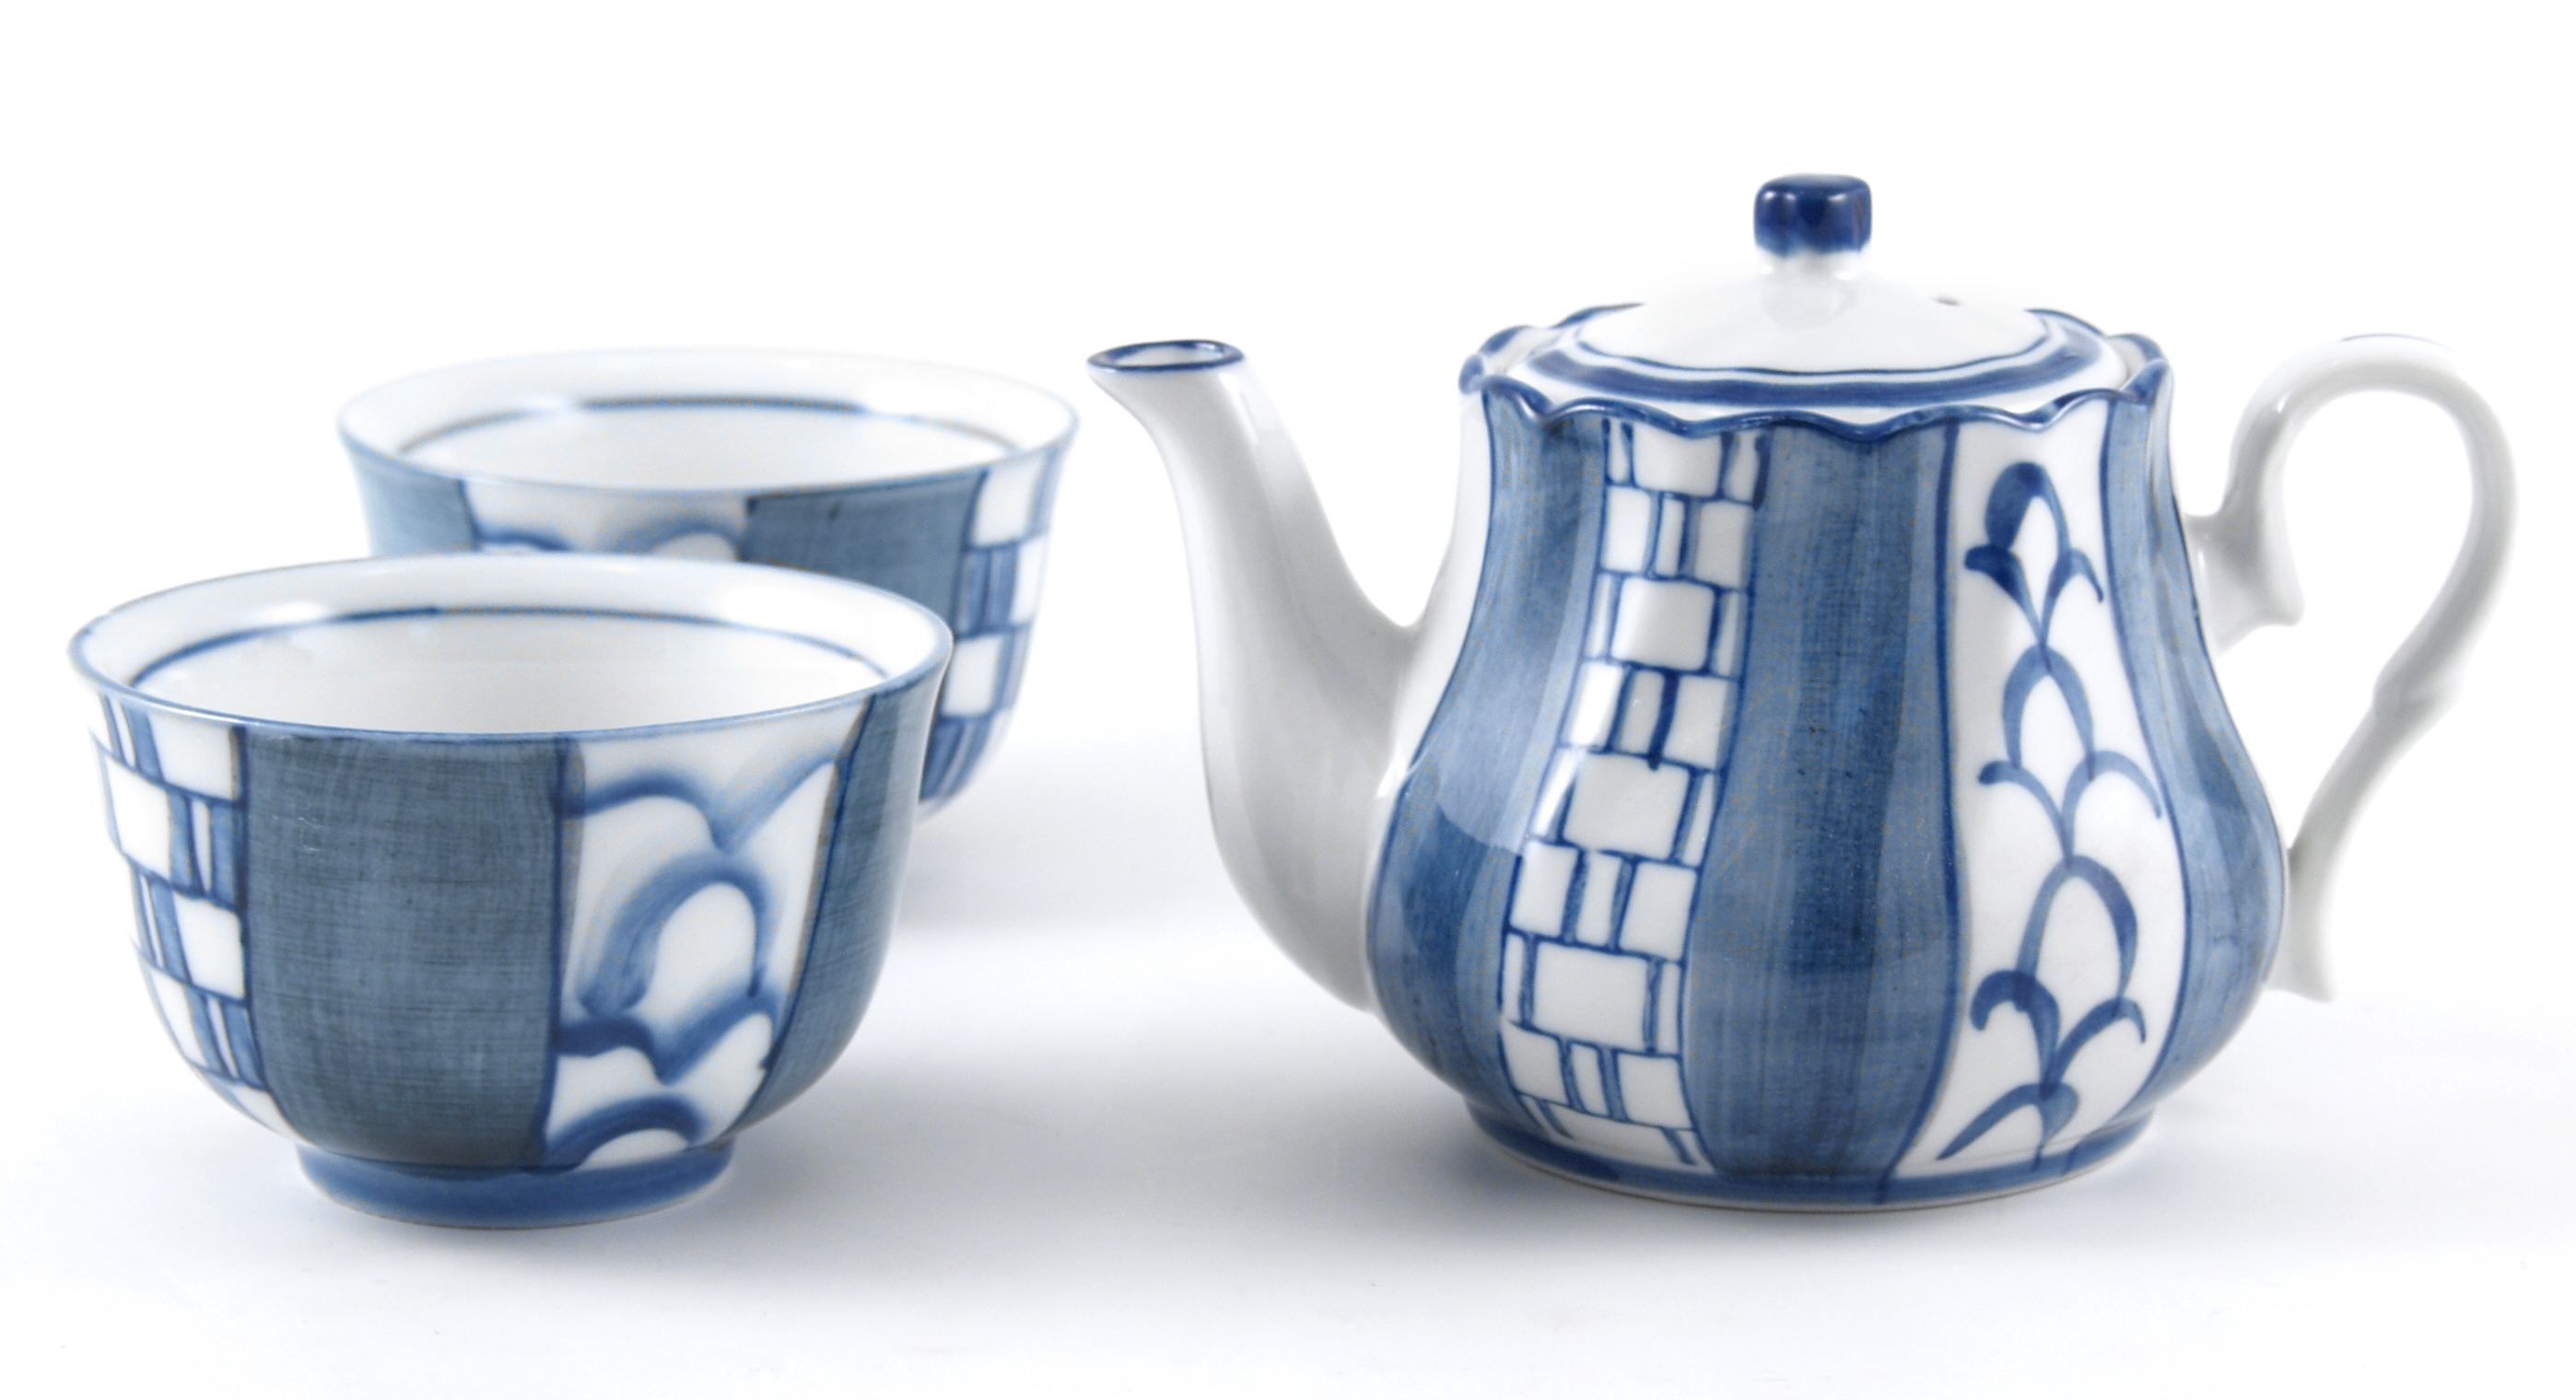 Asian Blue Basket Weave Teapot Set with Cups, 3 Piece